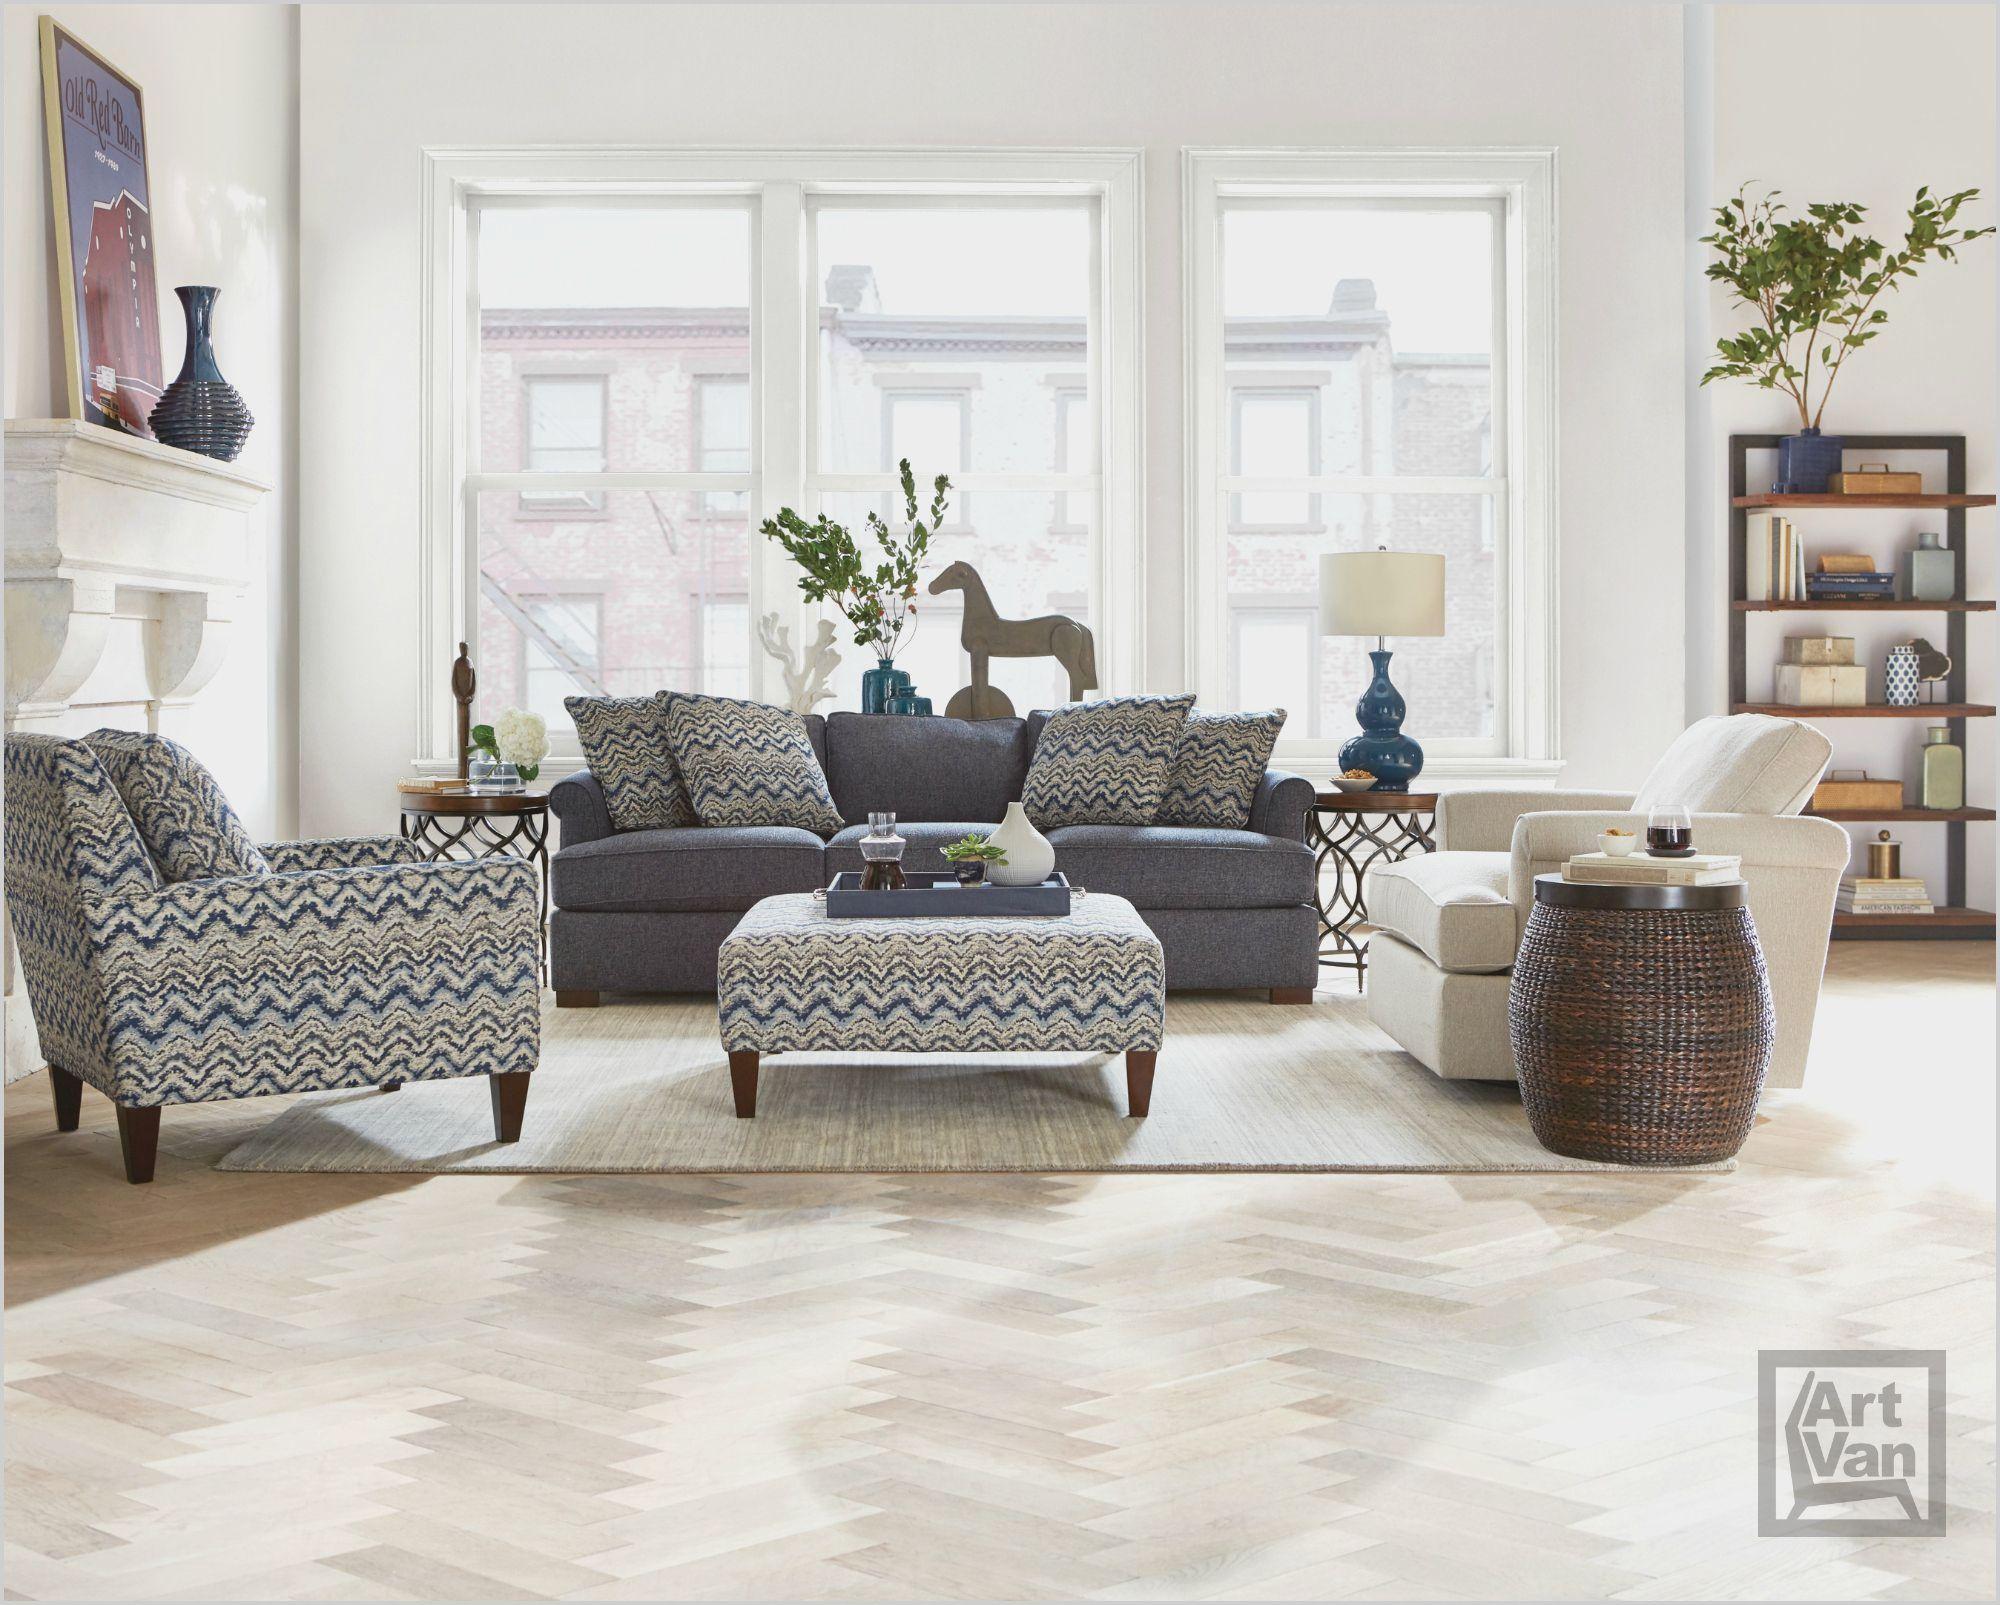 Nice Art Van Sofas Best Art Van Sofas 42 With Additional Modern Sofa Inspiration With Art Van Sofas Http Sof Furniture Leather Furniture Living Room Redo